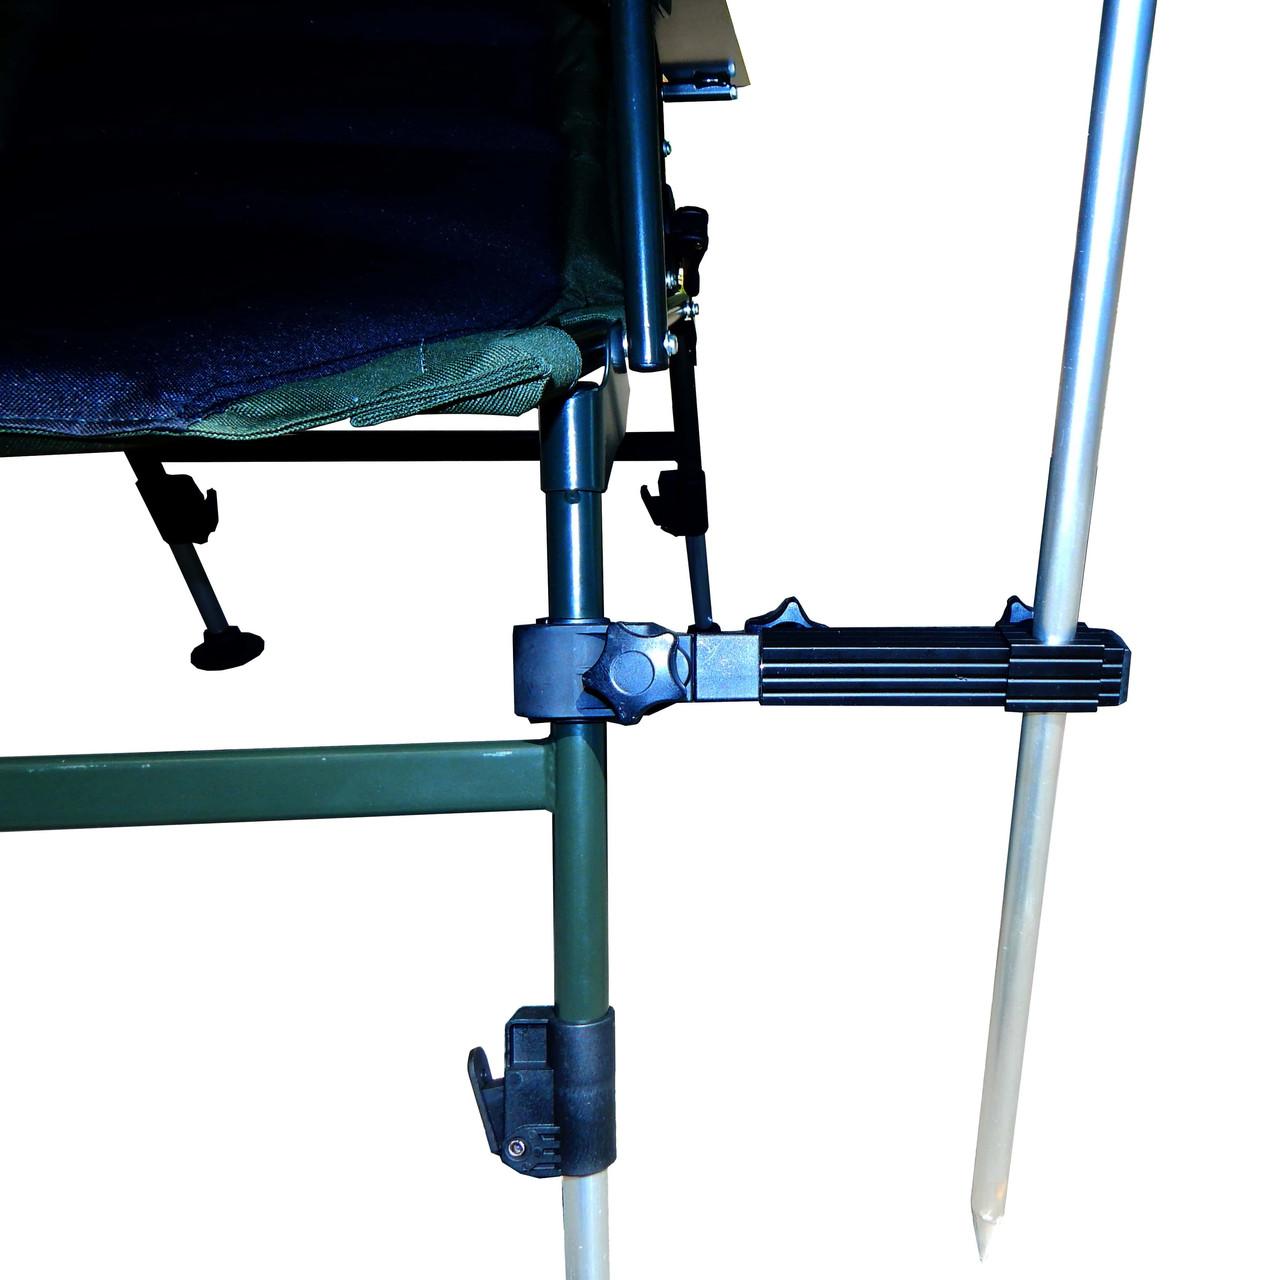 Держатель для зонта к креслу стулу раскладушке  Ranger  алюминий/пластик